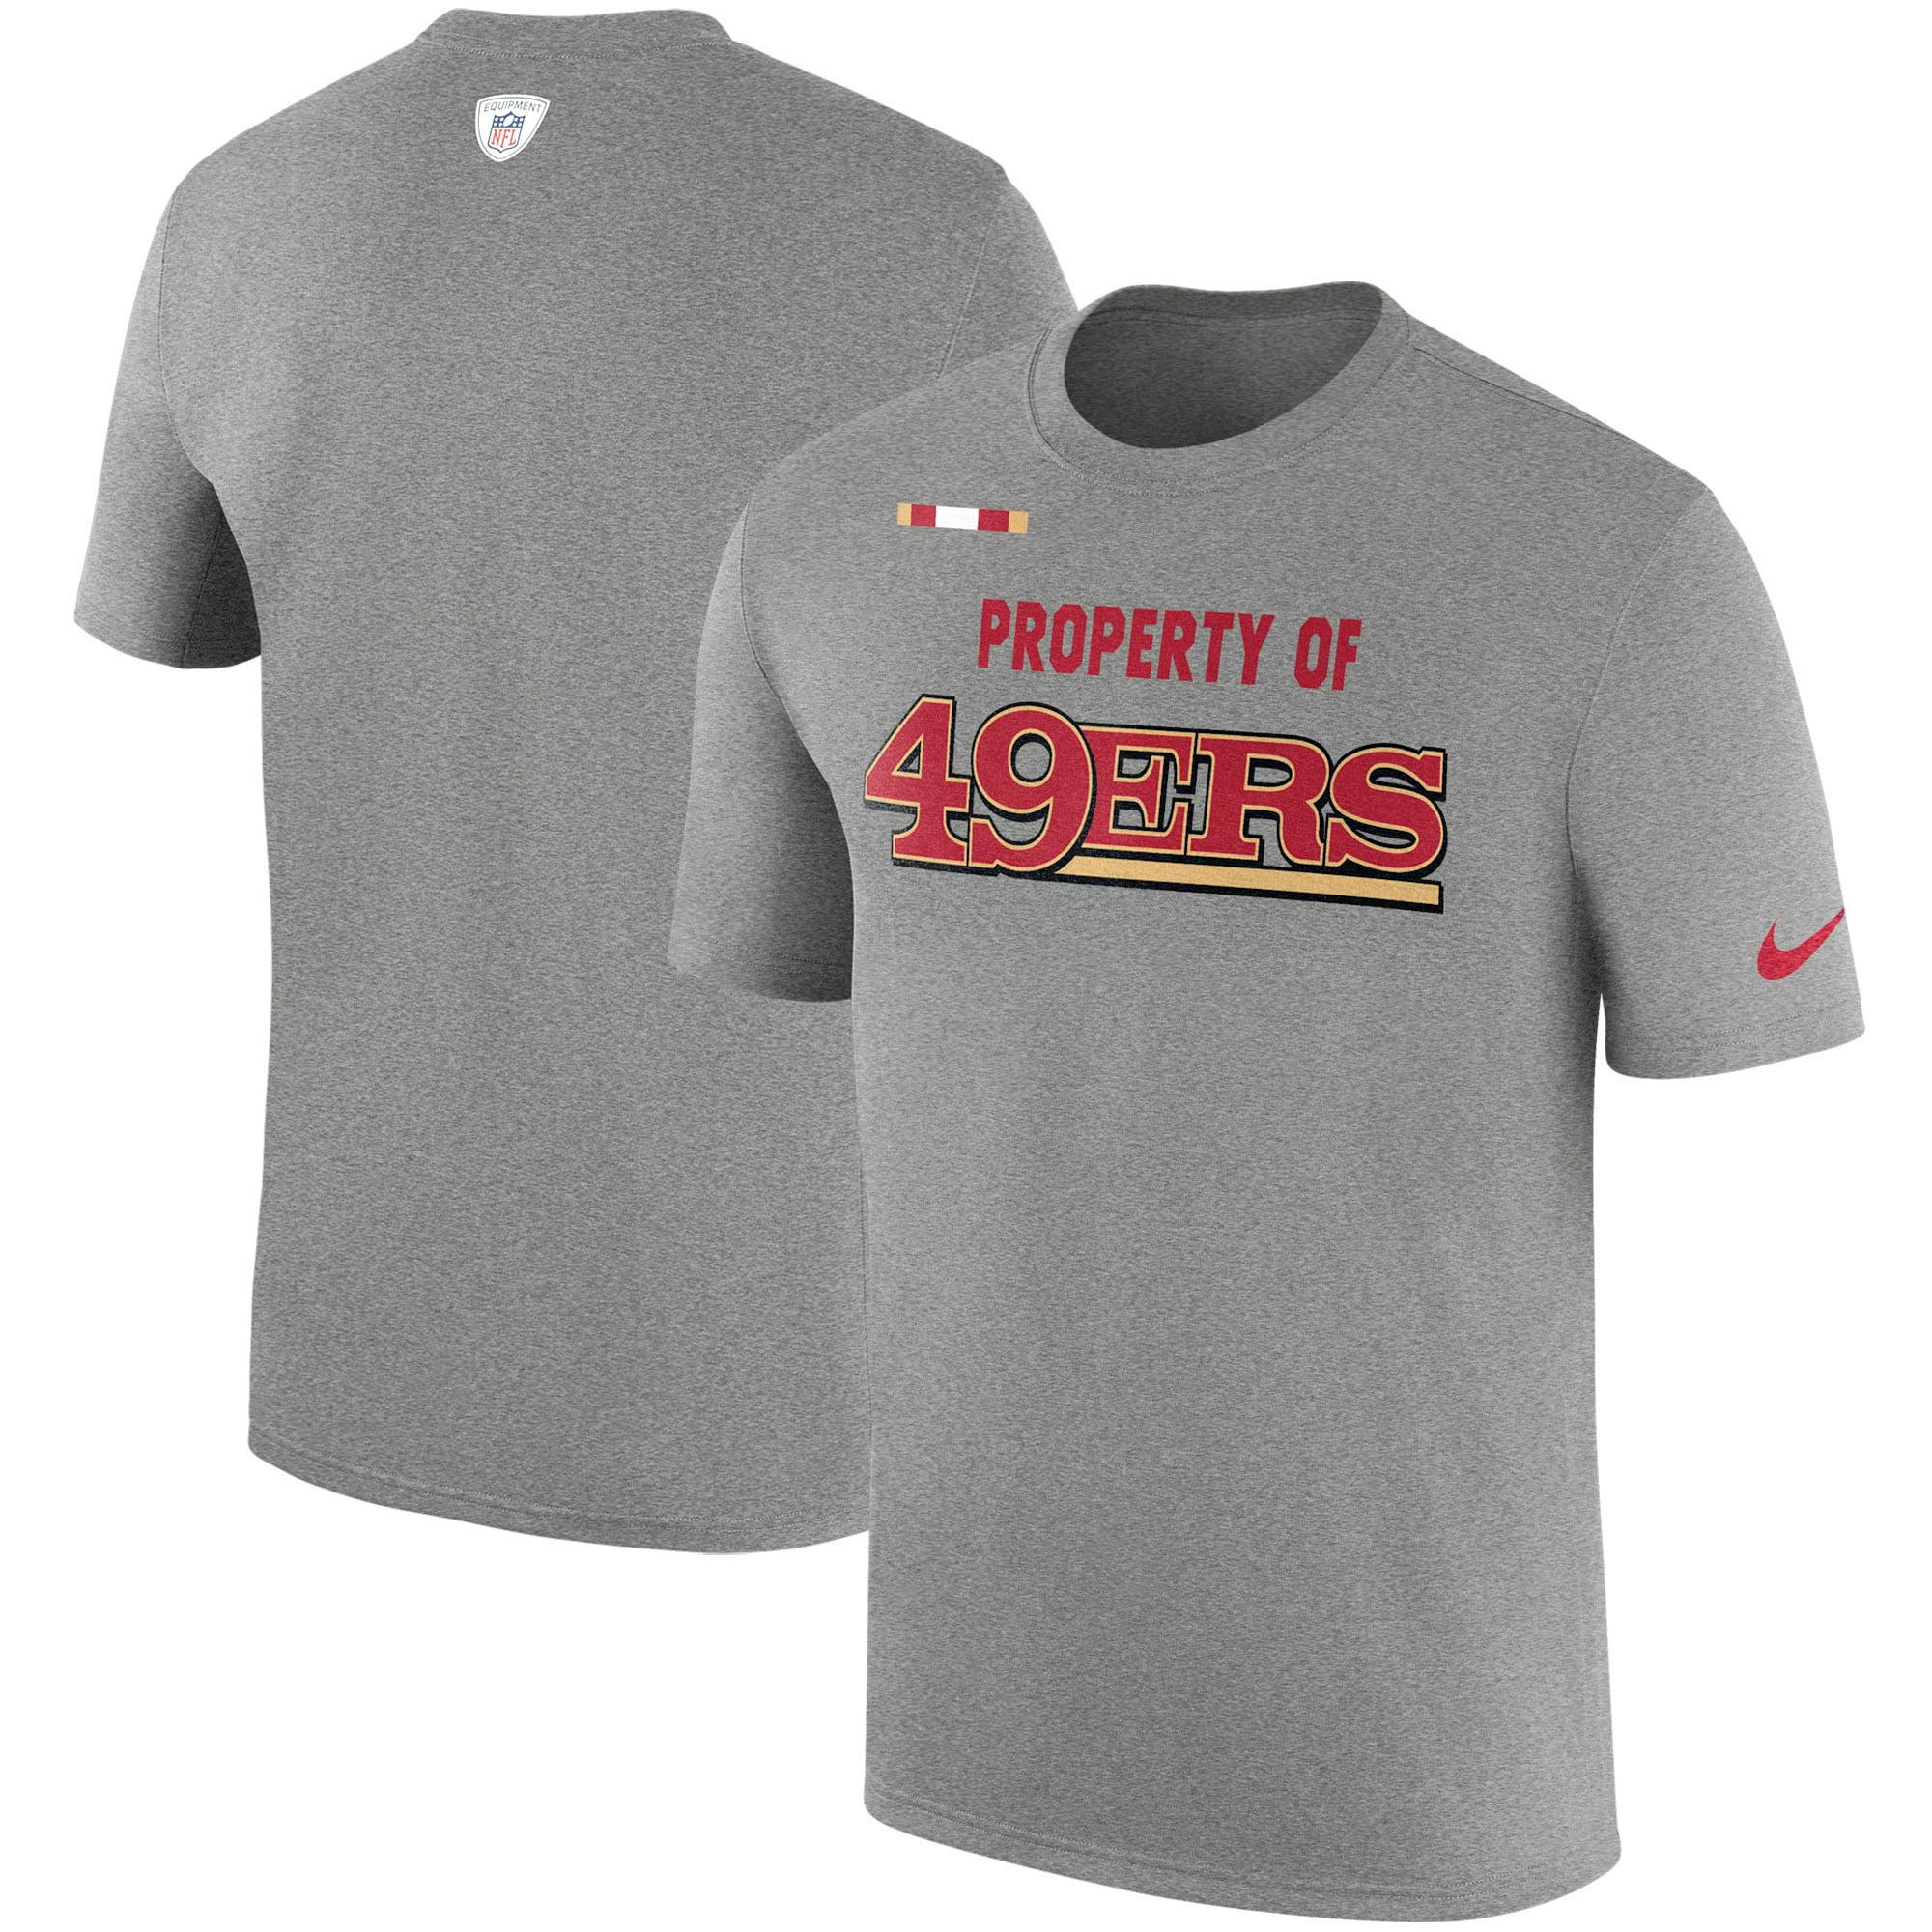 San Francisco 49ers Nike Sideline Property Of Facility T-Shirt - Heather Gray